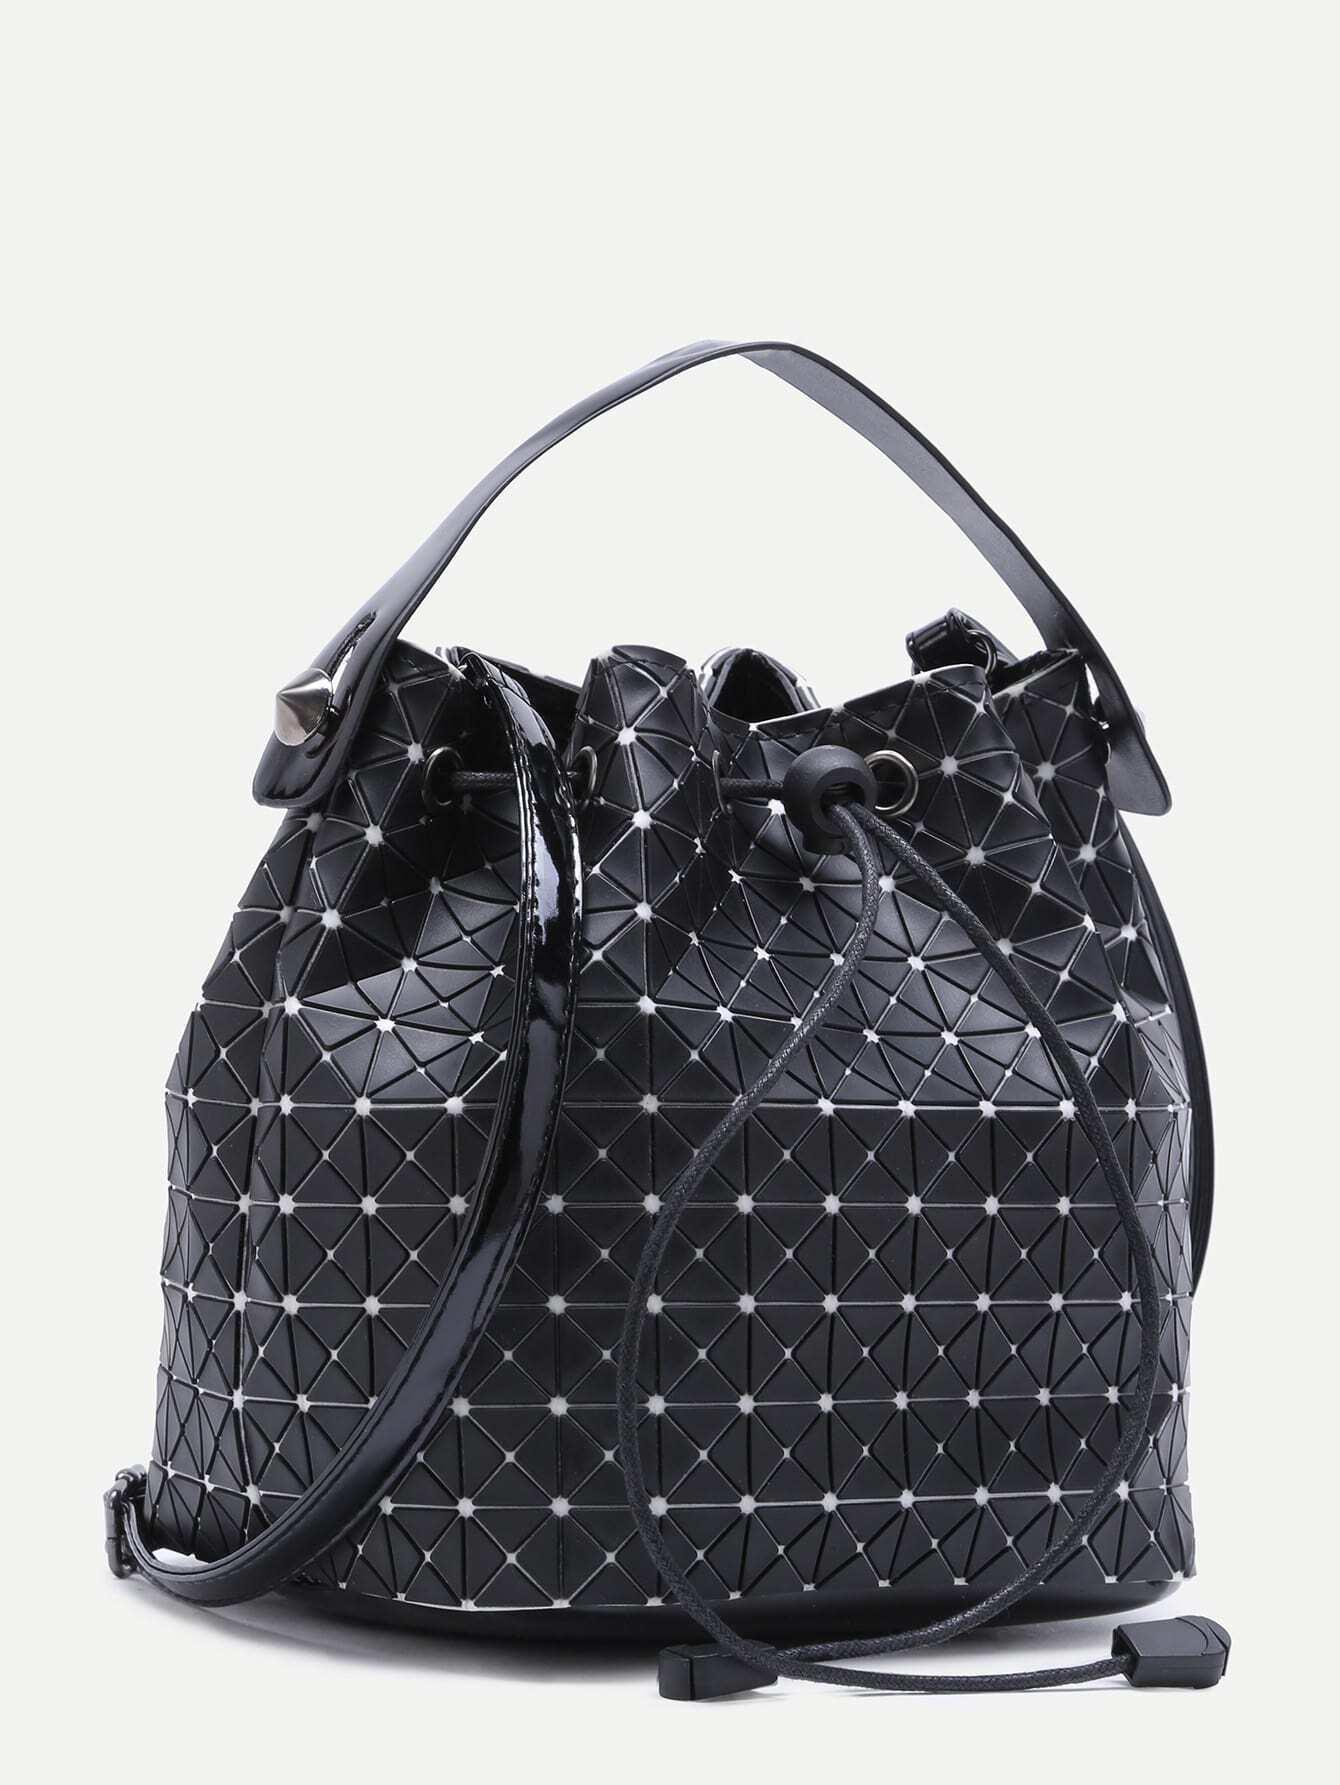 bag161024315_2